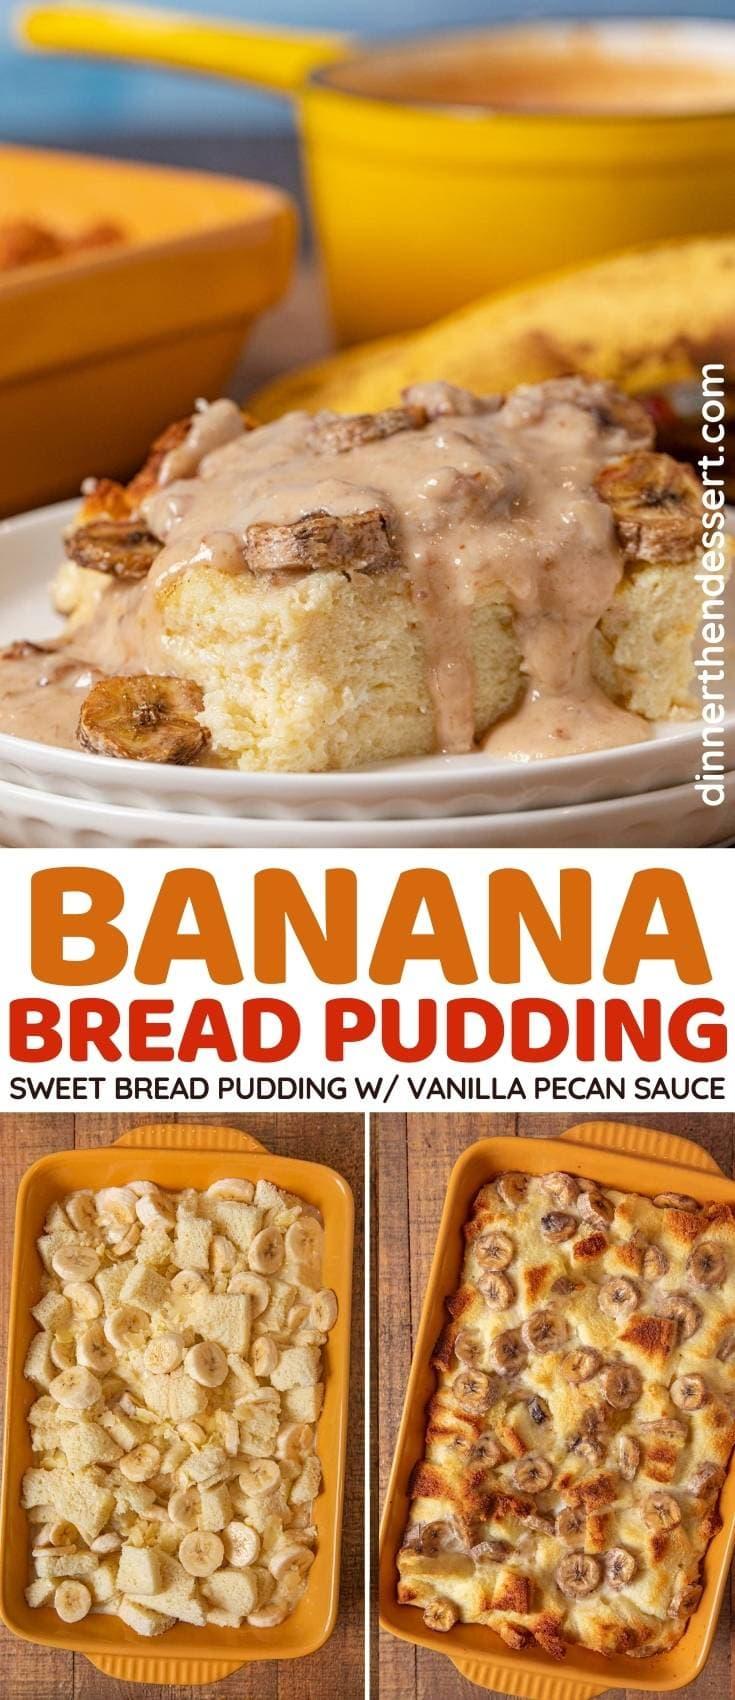 Banana Bread Pudding collage